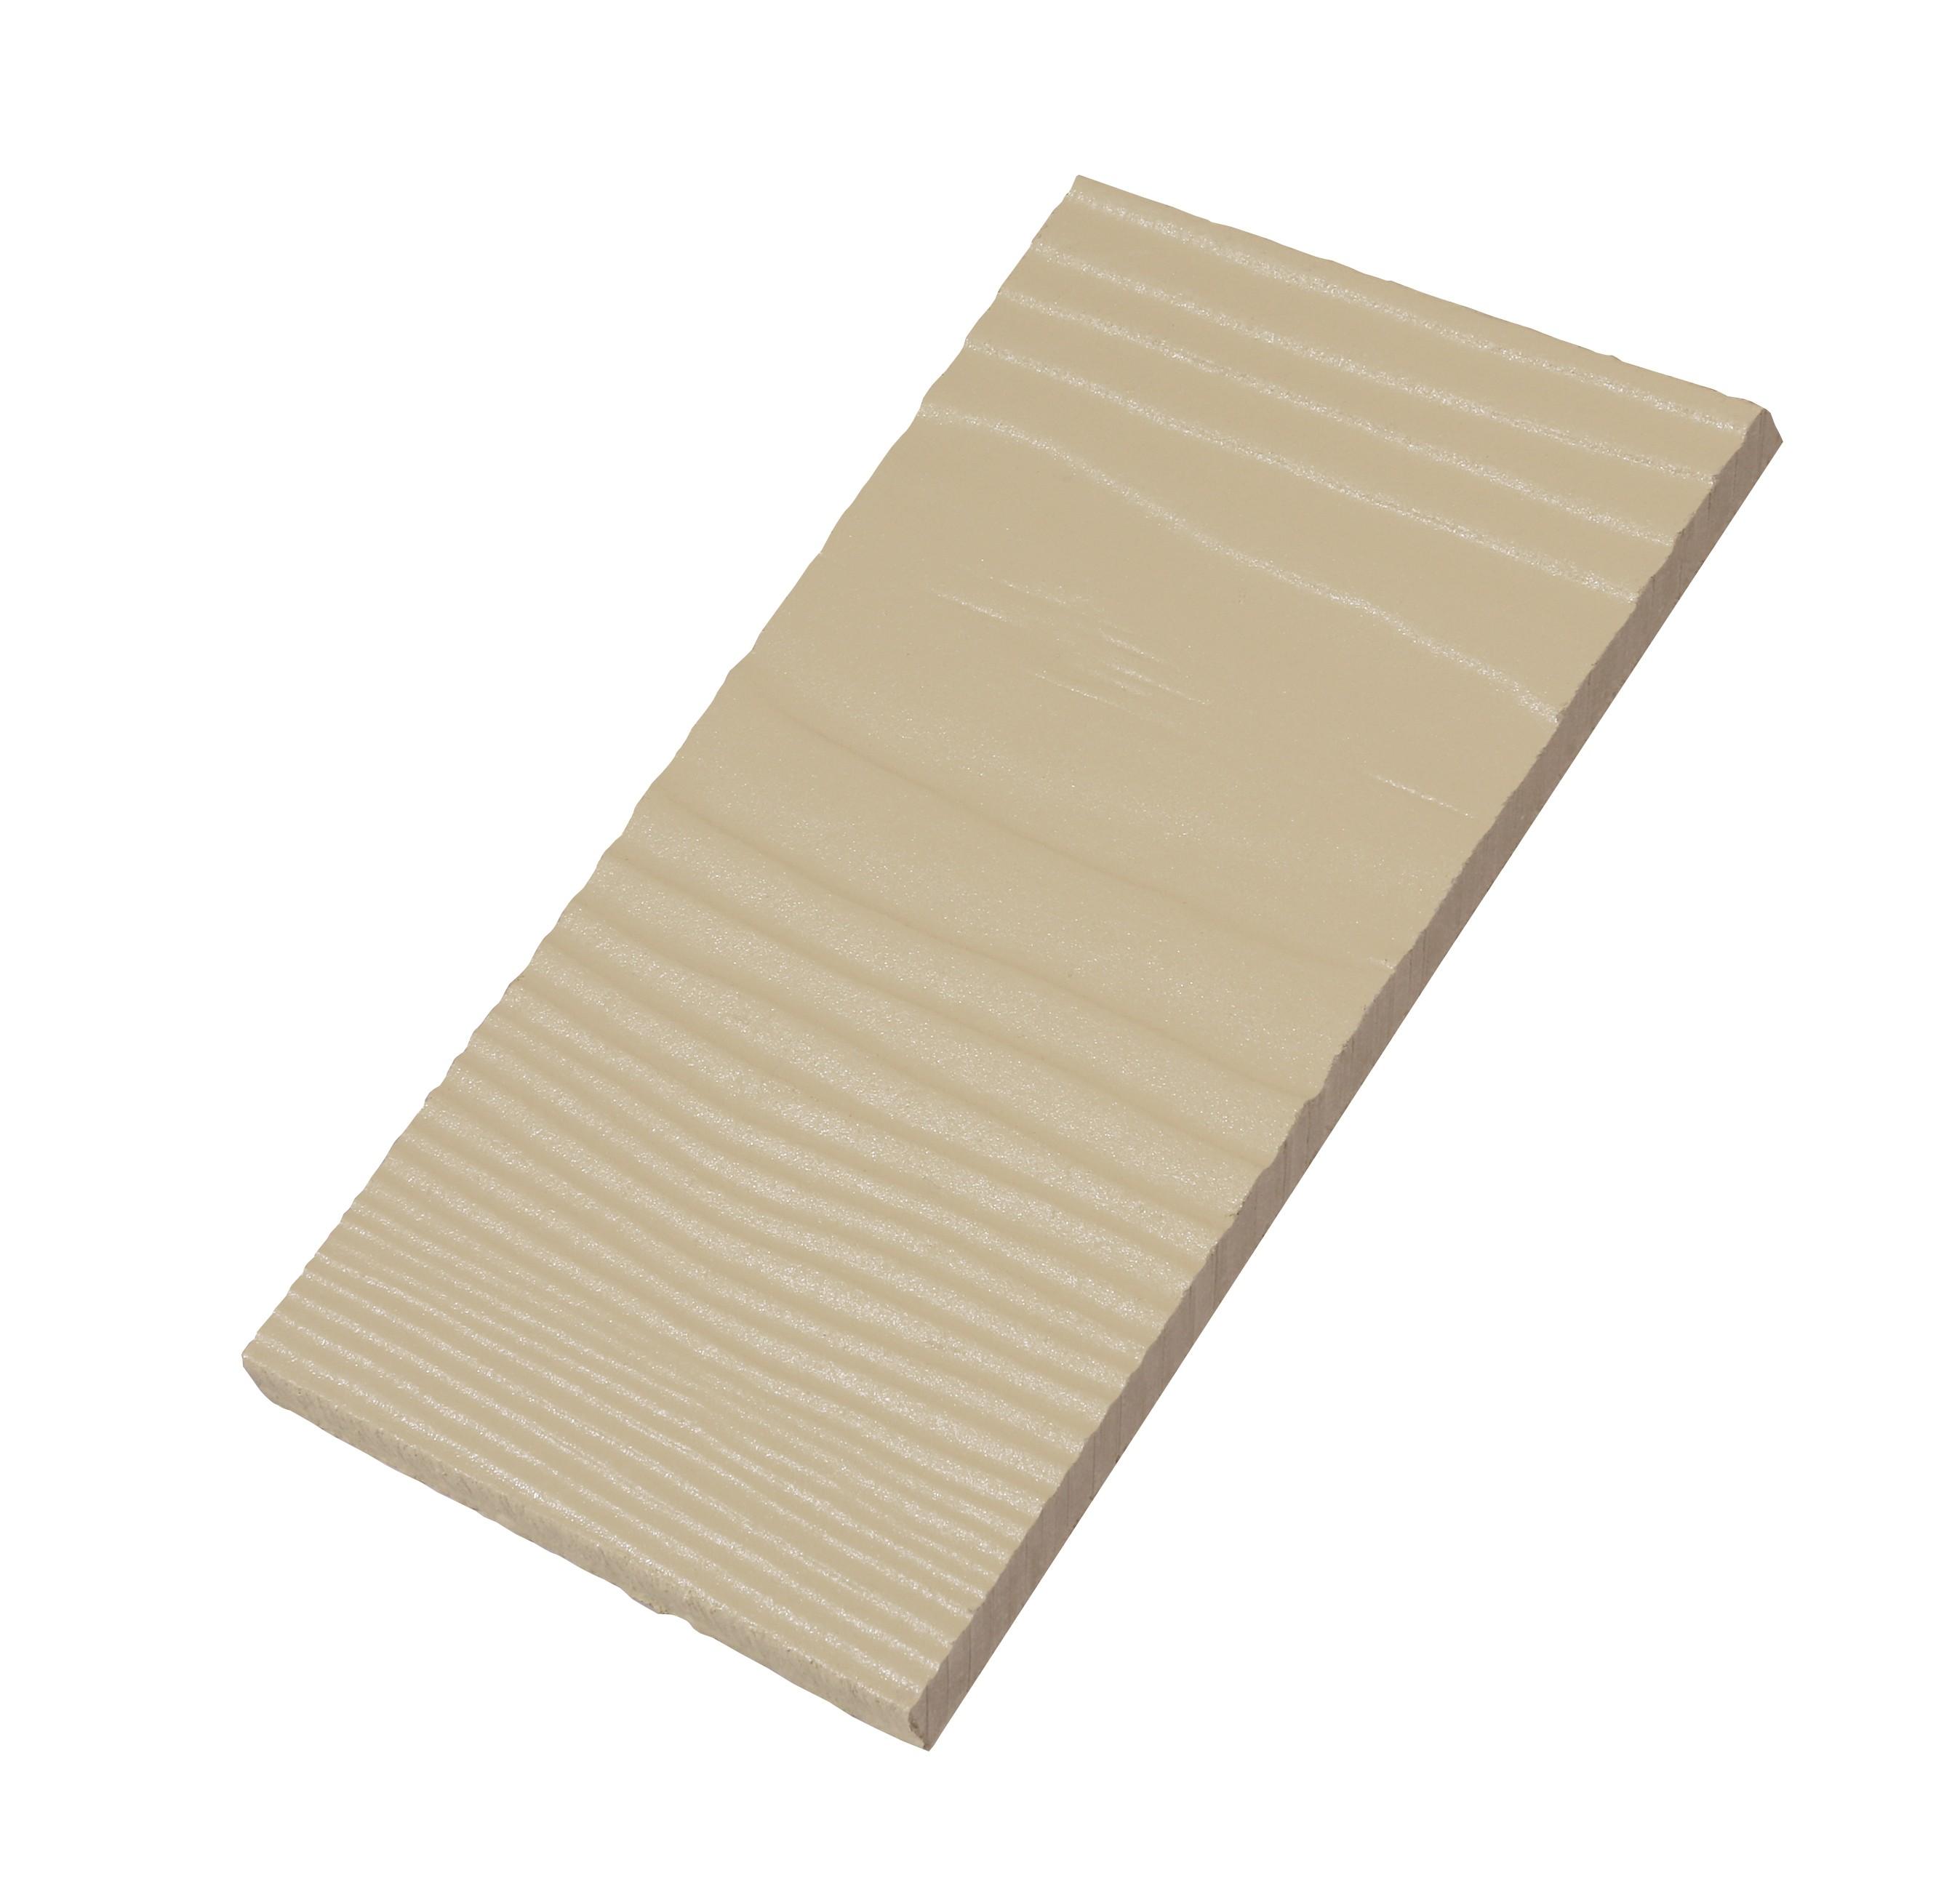 Cedral Lap Weatherboard Cladding - Beige